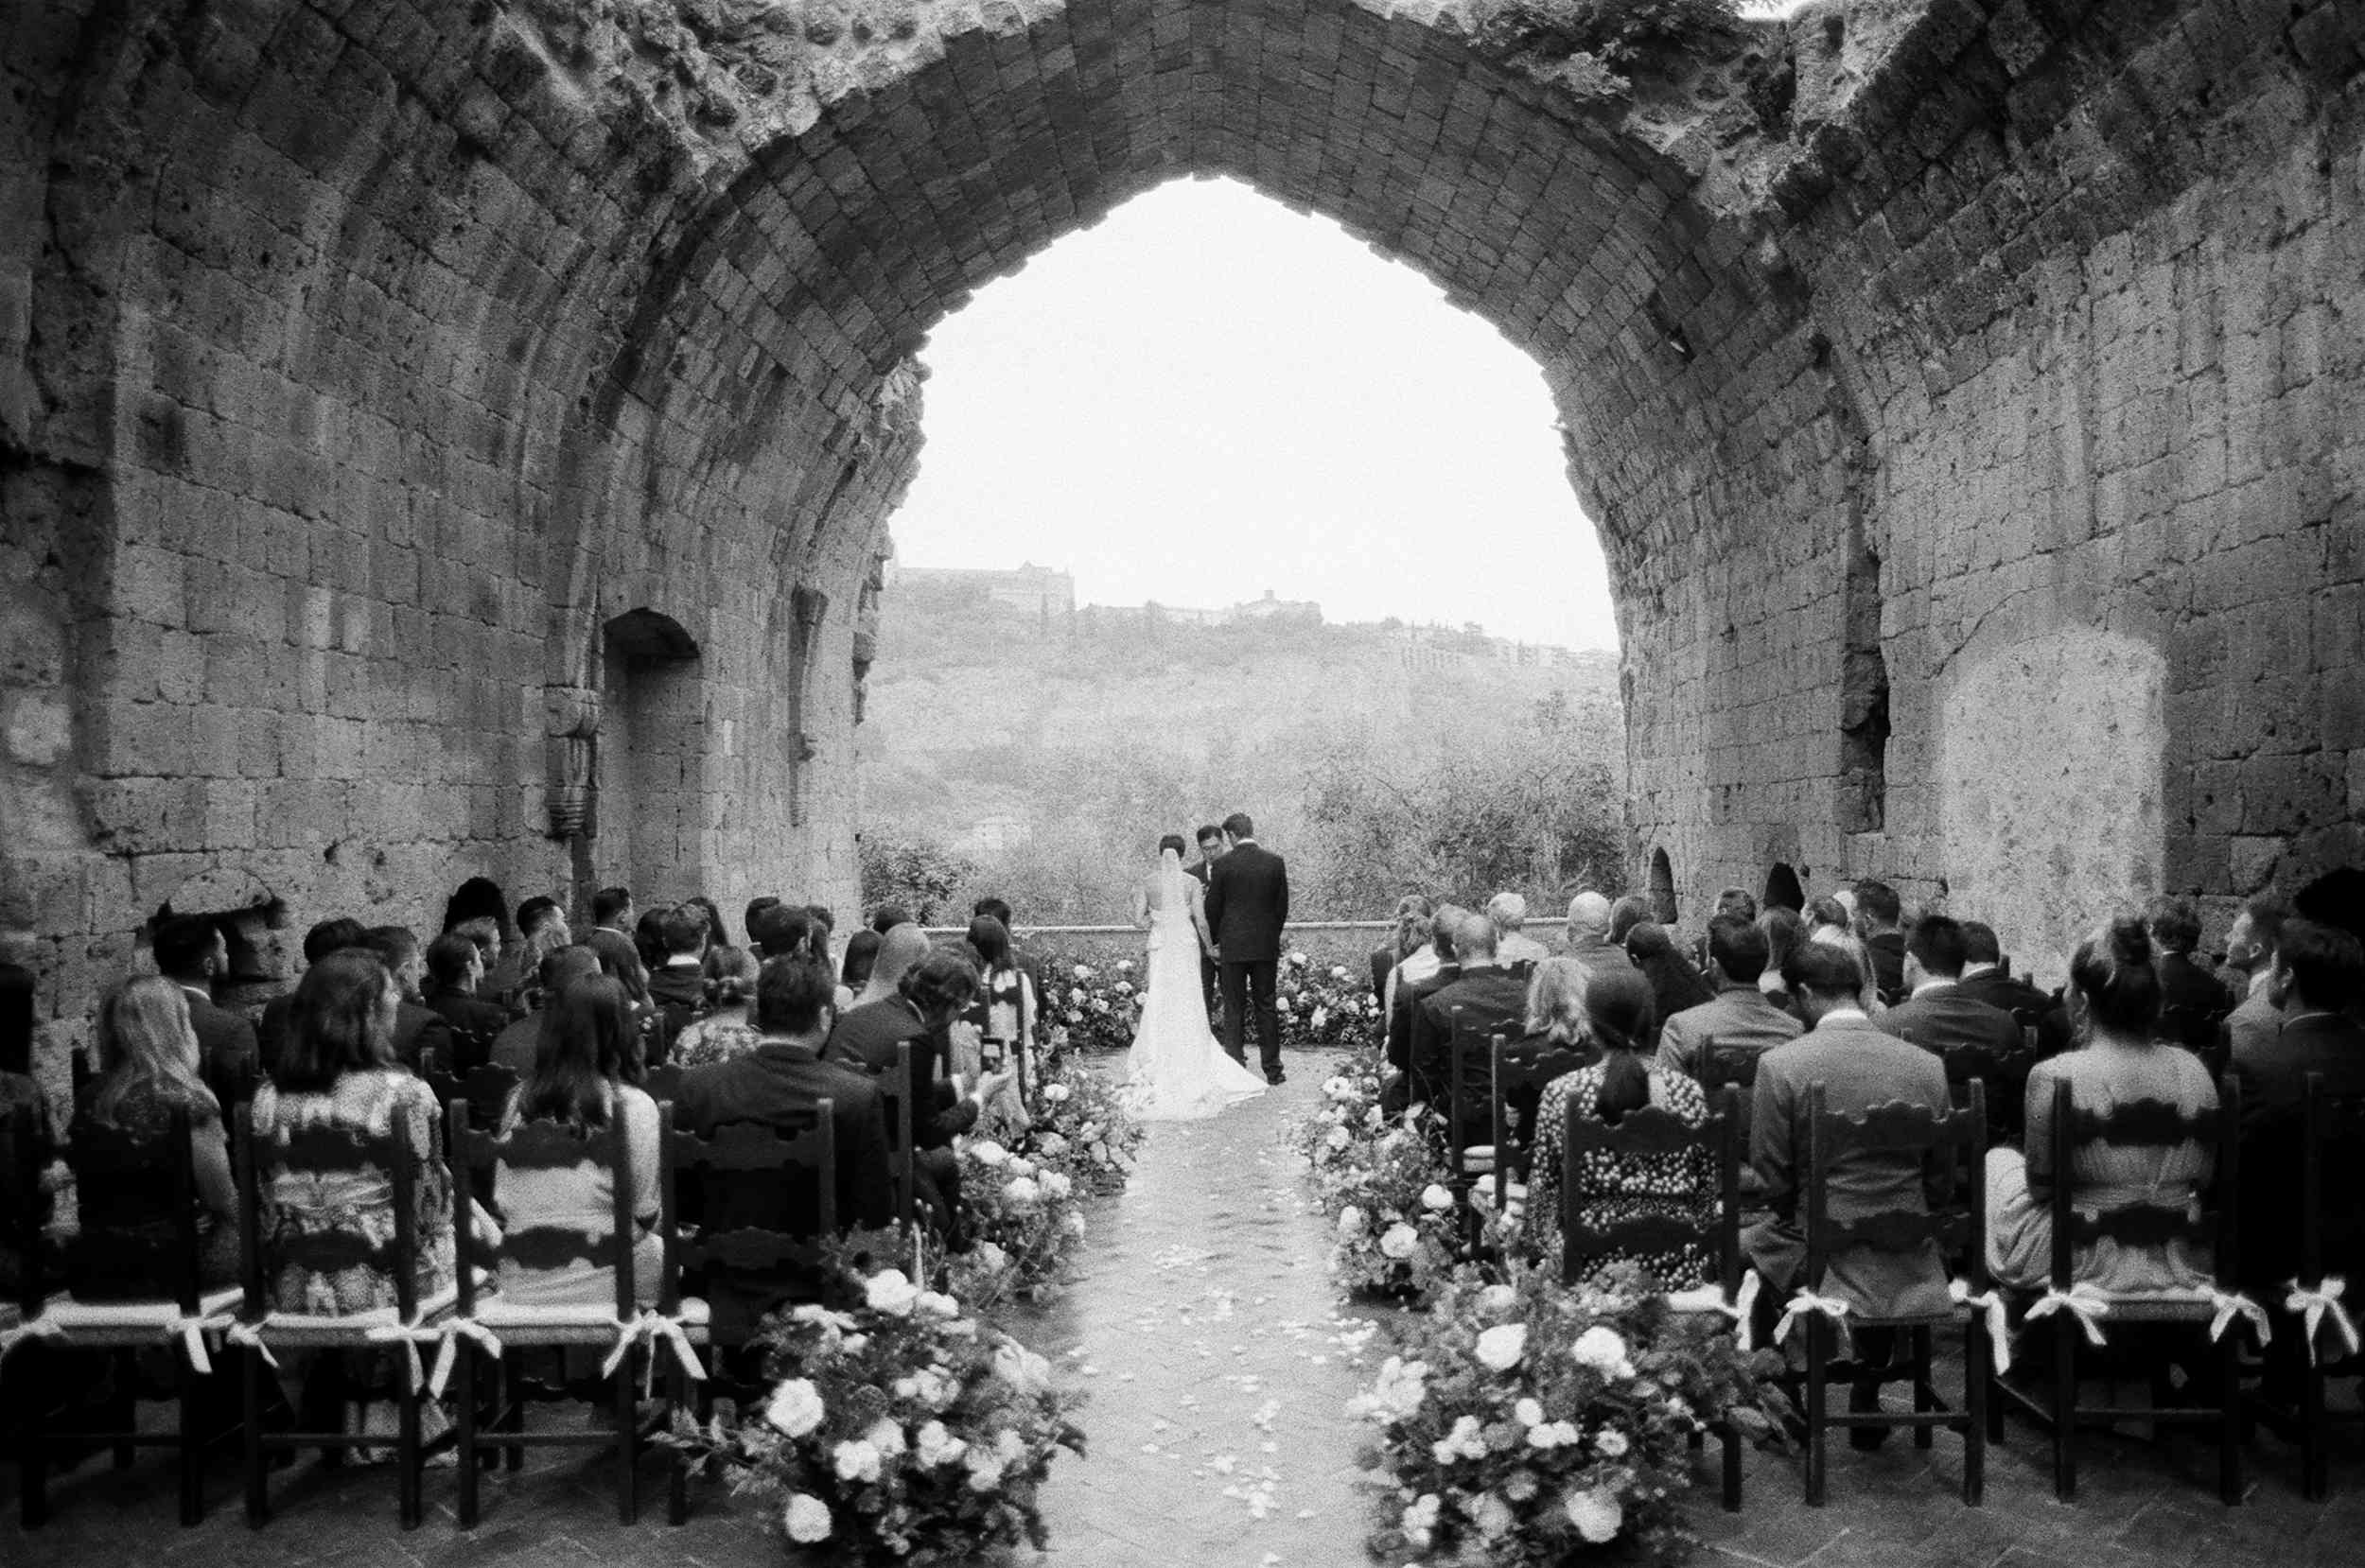 classic la badia italian wedding, bride and groom exchanging vows